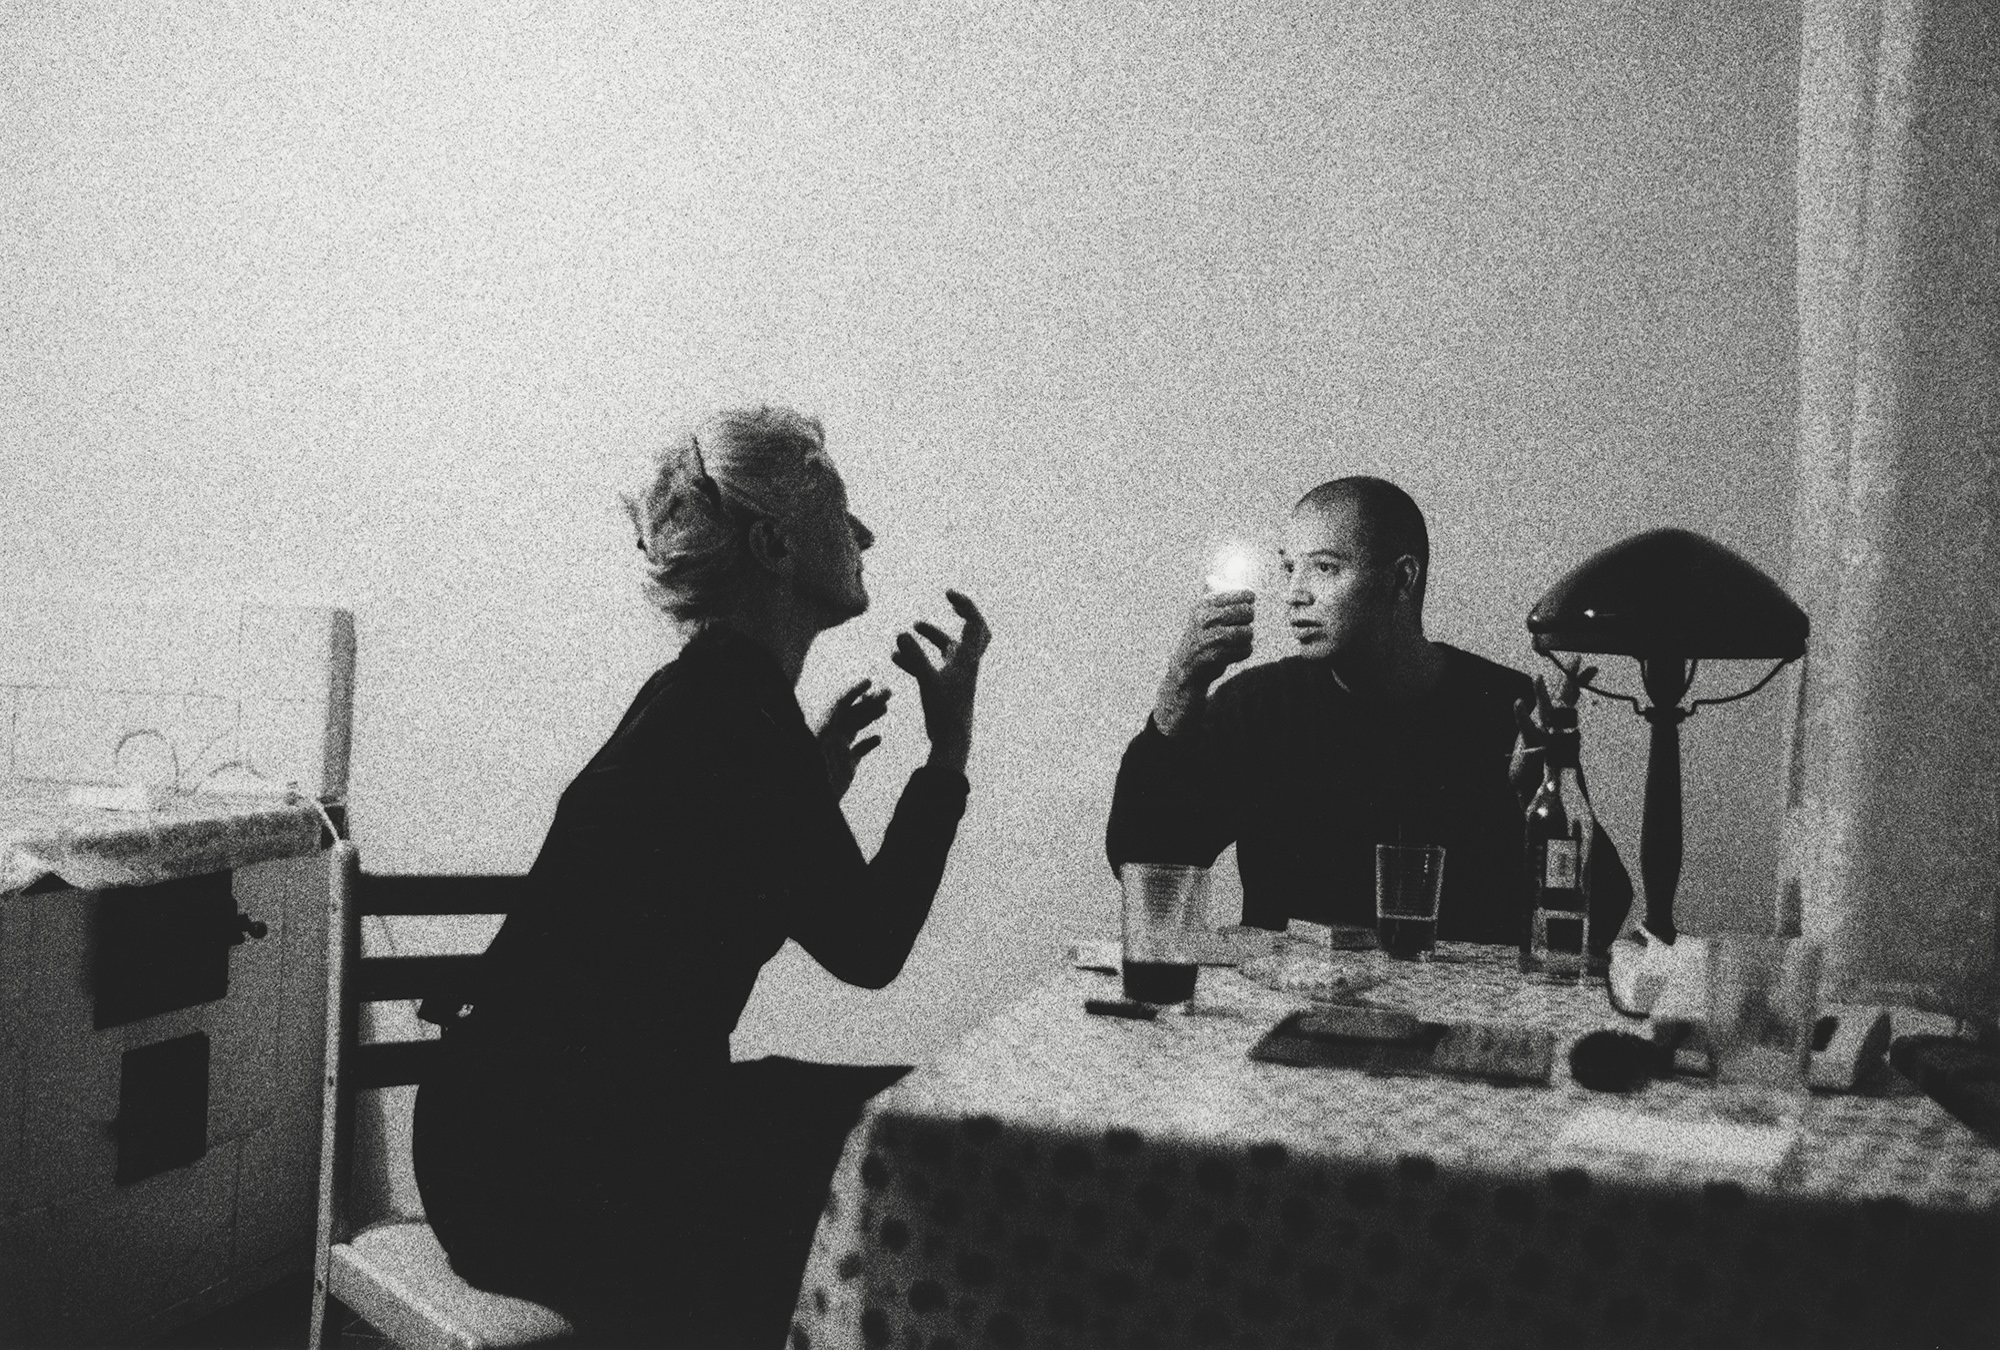 Paulita and Frank, St. Petersburg, Russia, 2001